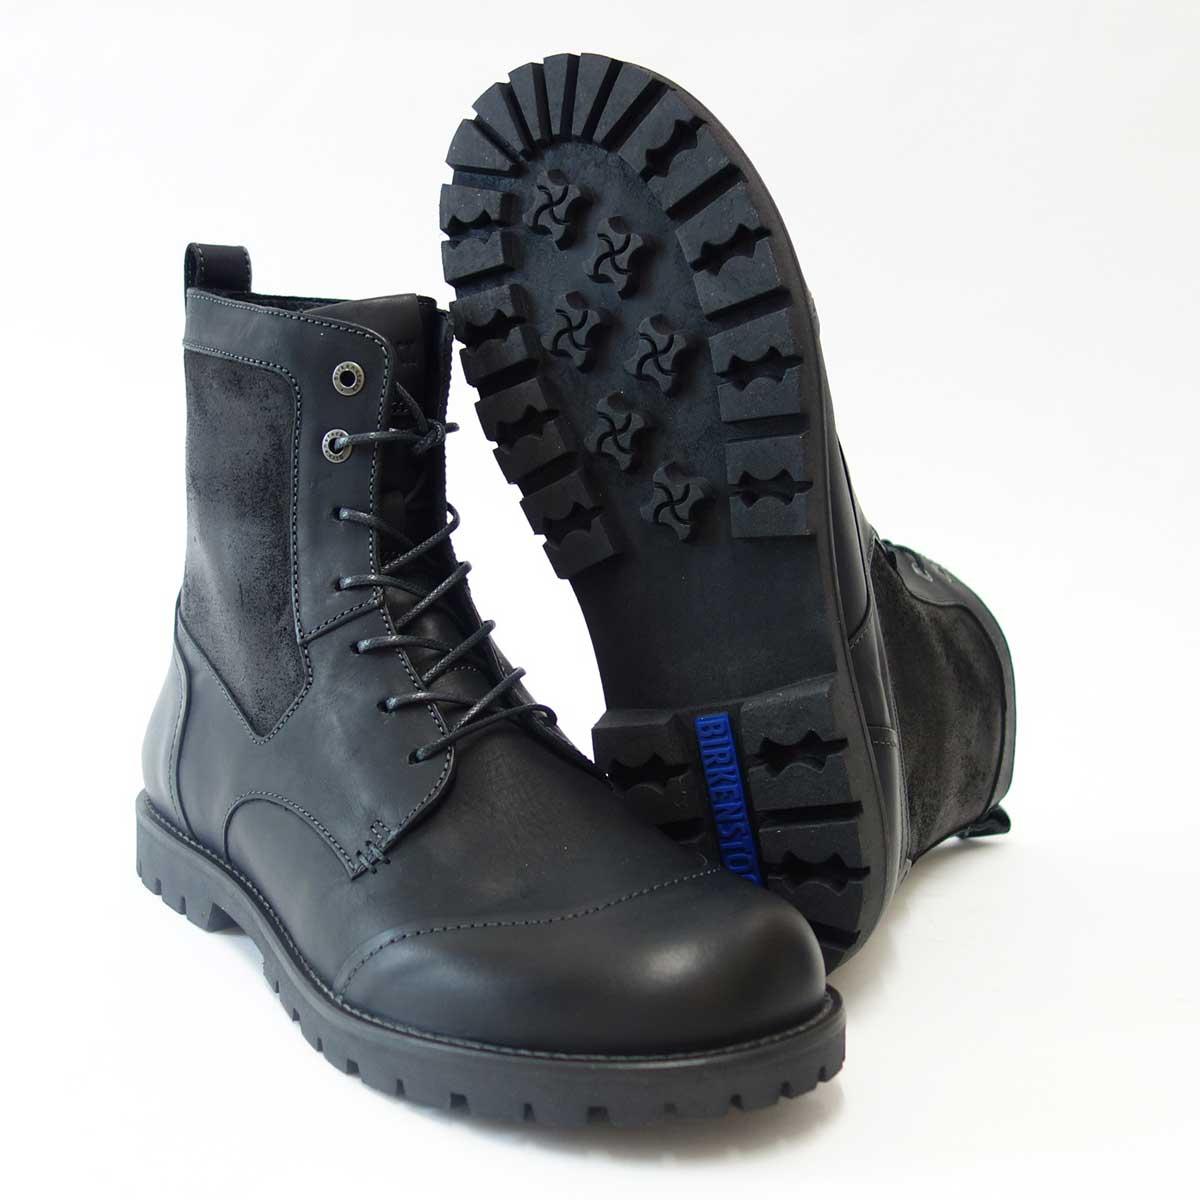 BIRKENSTOCK(ビルケンシュトック) GILFORD HIGH(ギルフォードハイ)メンズ 489111(天然皮革/ブラック)ヨーロッパ生まれの快適ブーツ「靴」